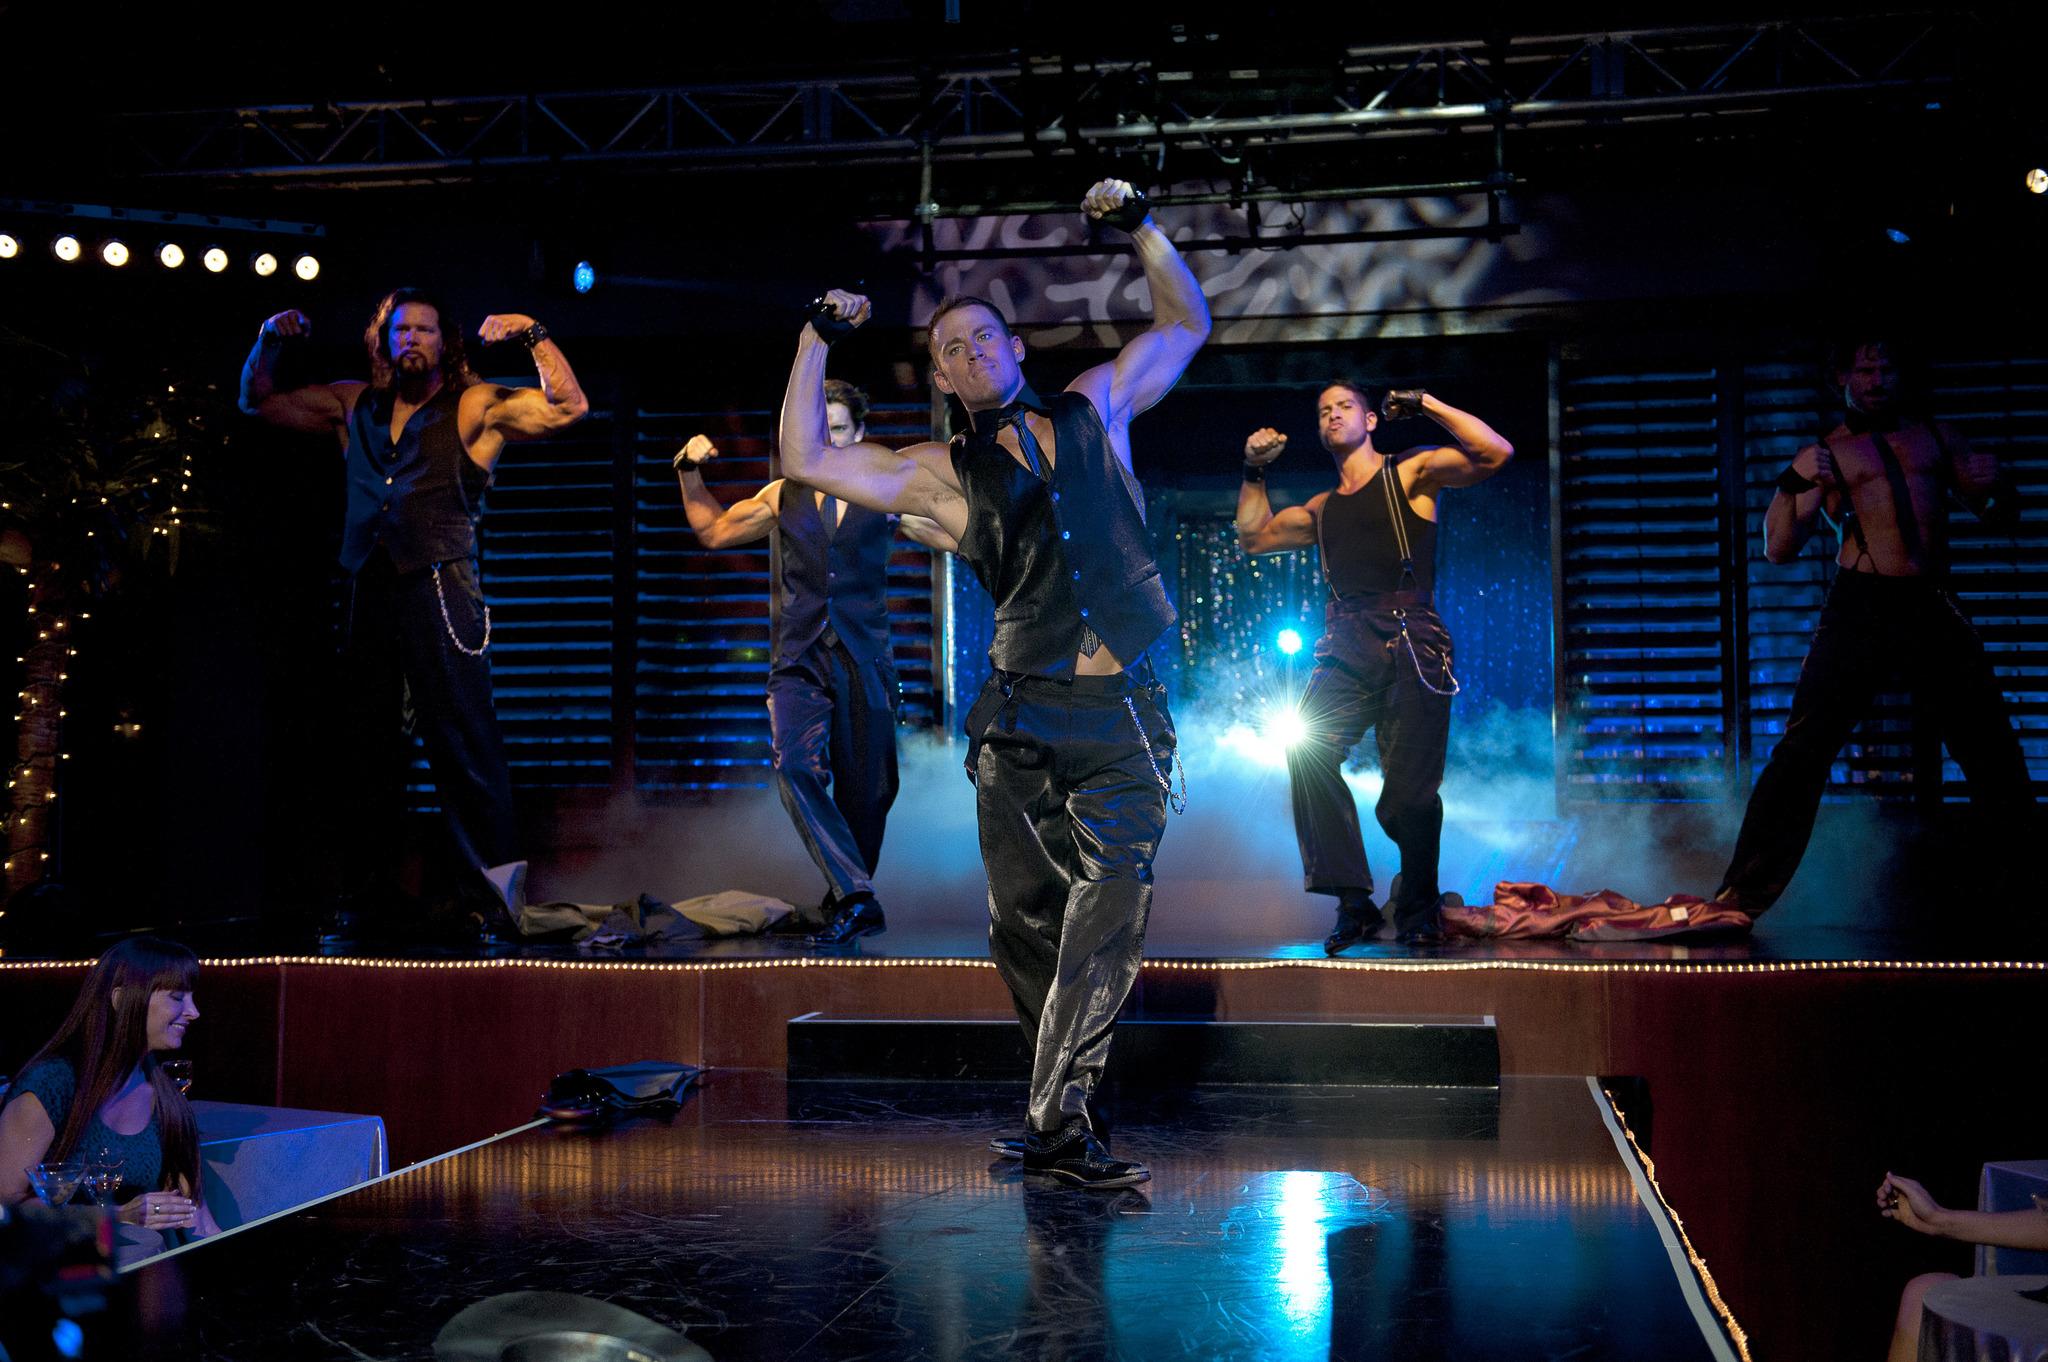 Matt Bomer, Joe Manganiello, Kevin Nash, Adam Rodriguez, and Channing Tatum in Magic Mike (2012)